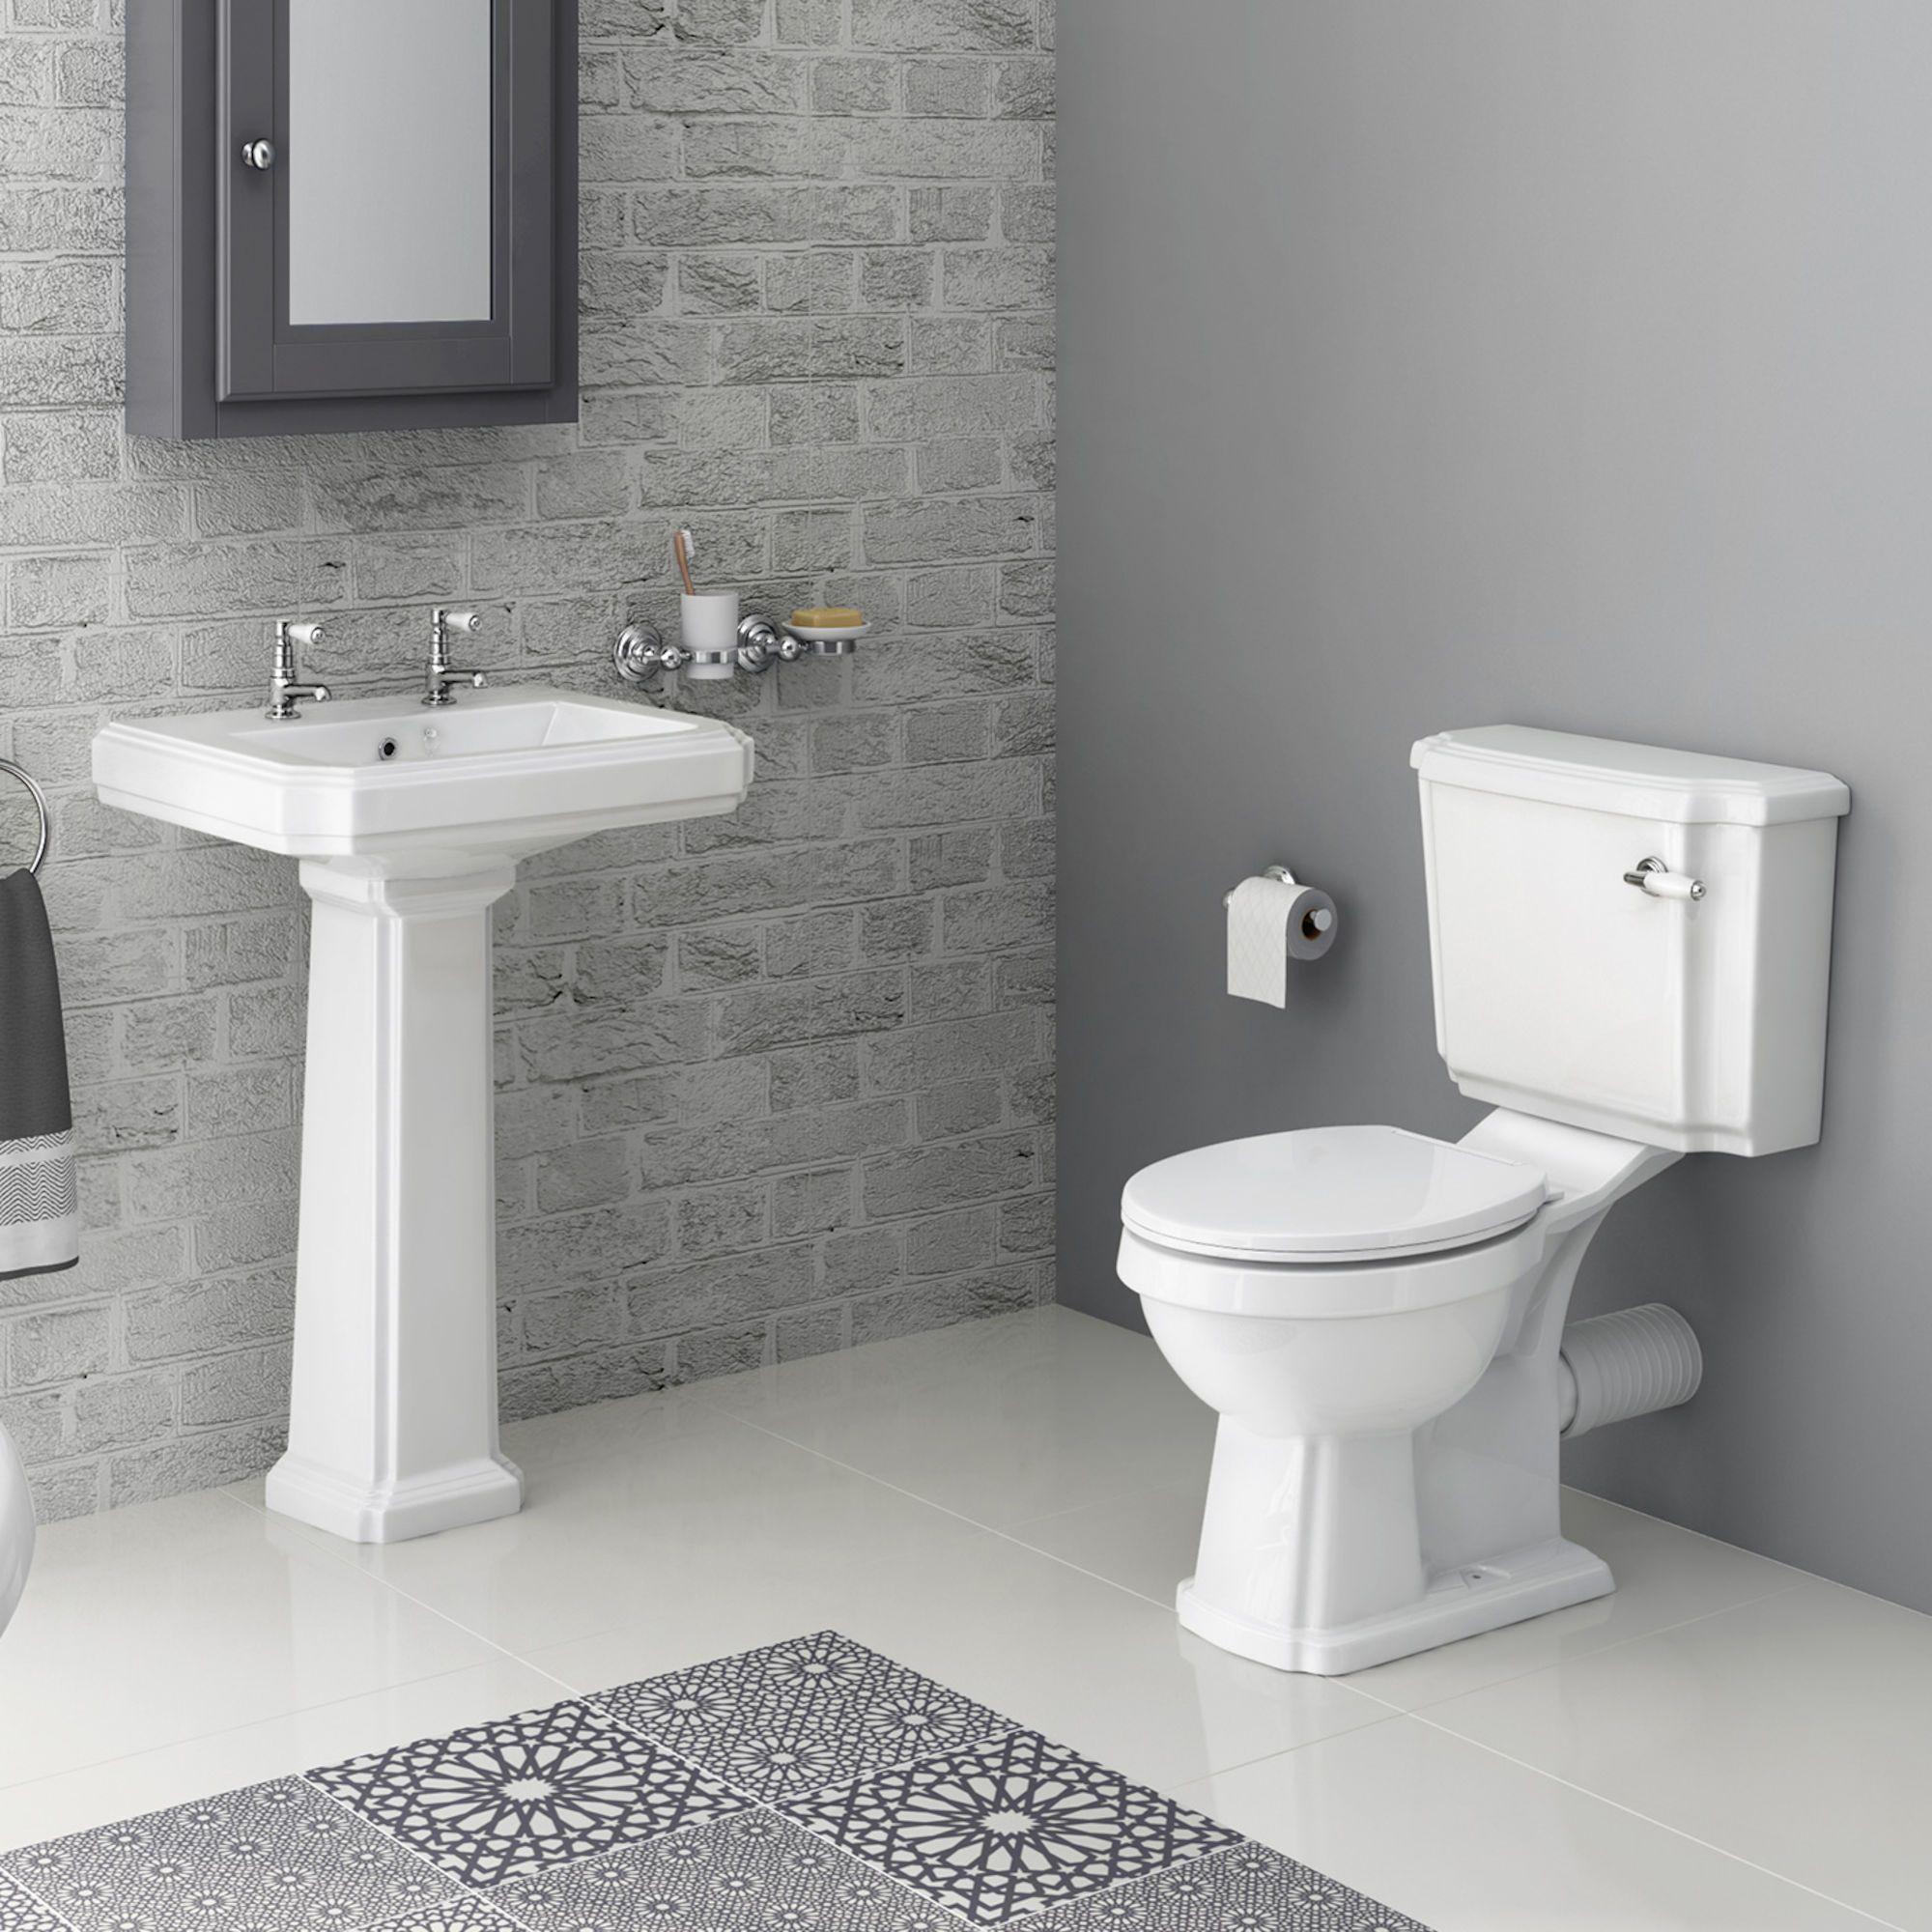 Georgia Ii Traditional Close Coupled Toilet Double Tap Hole Basin Set Banos